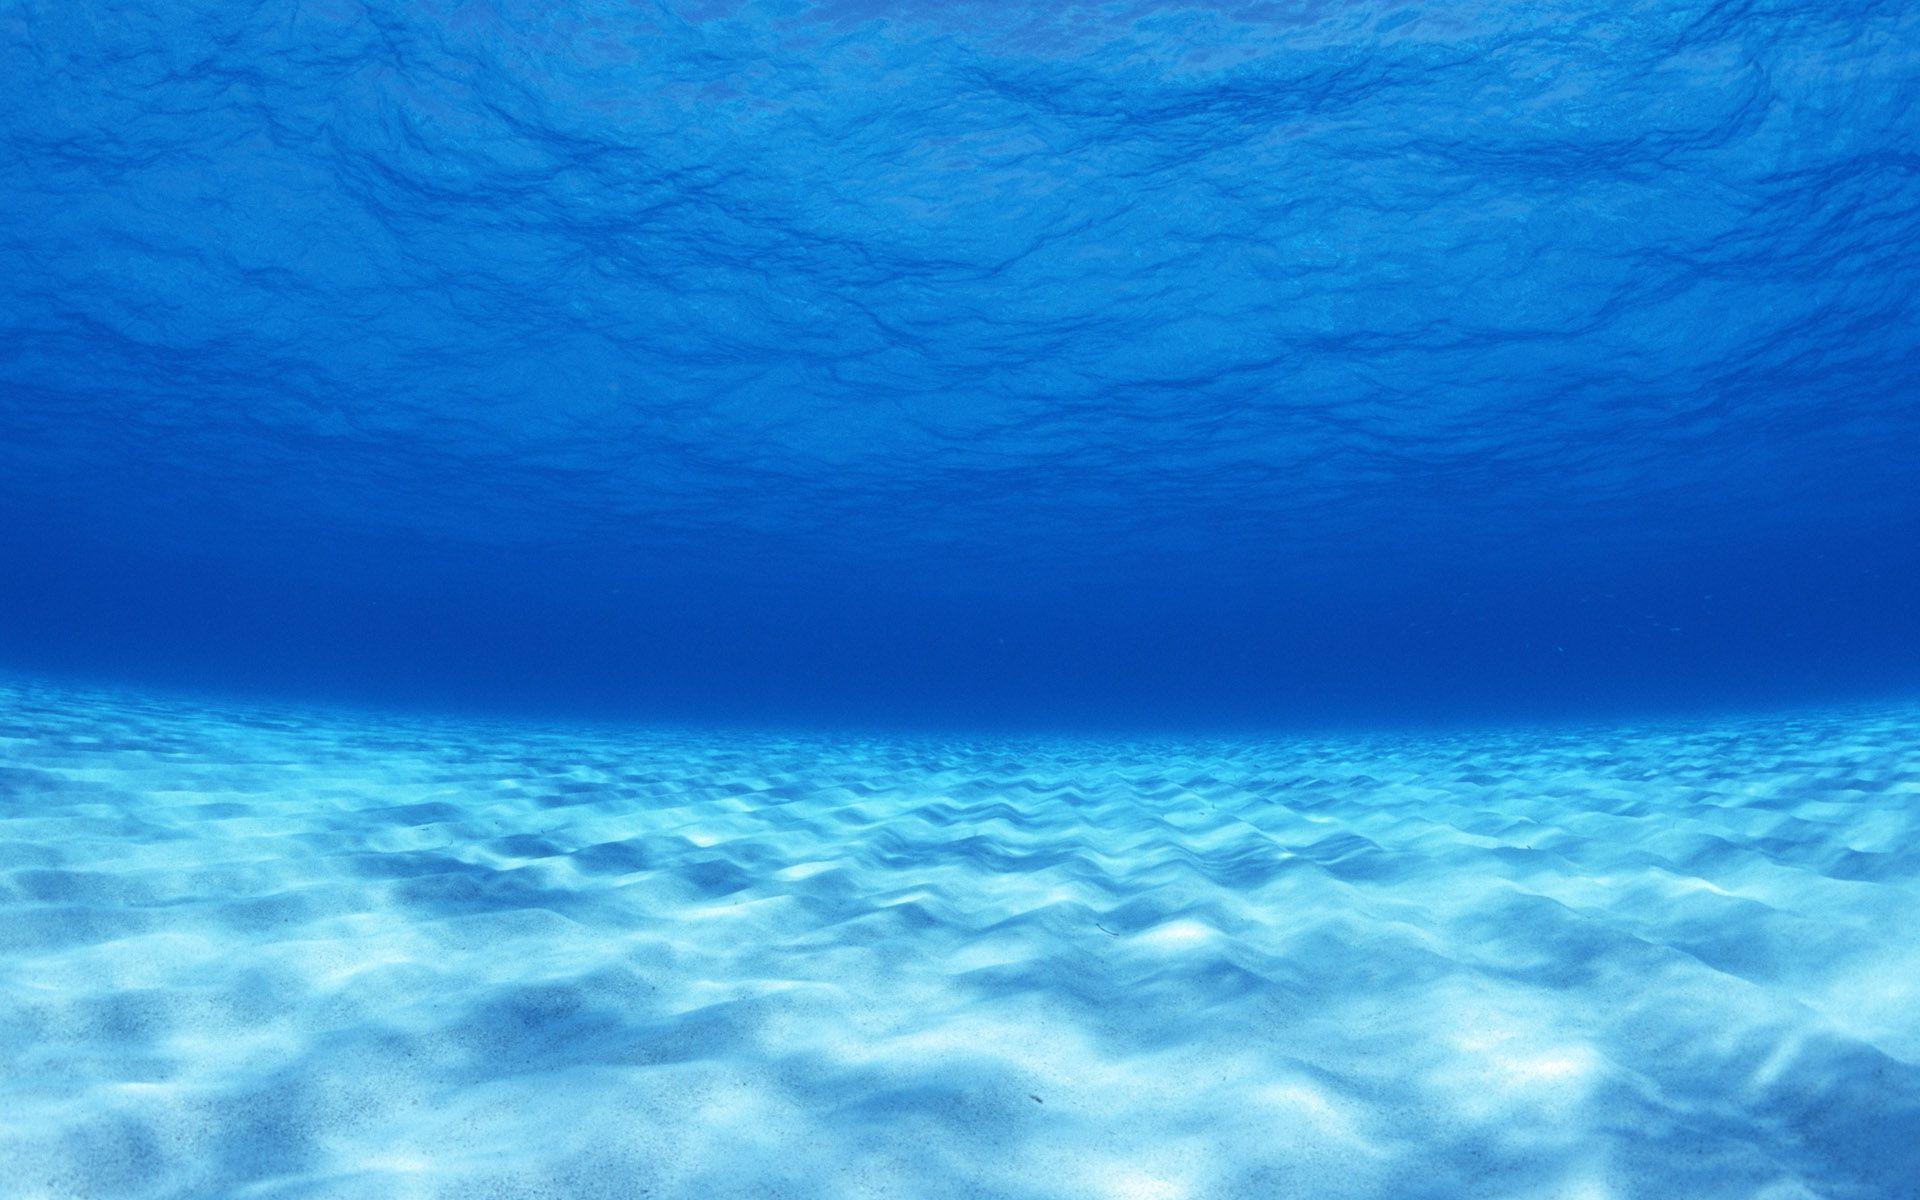 Under Sea Wallpaper 77 Images